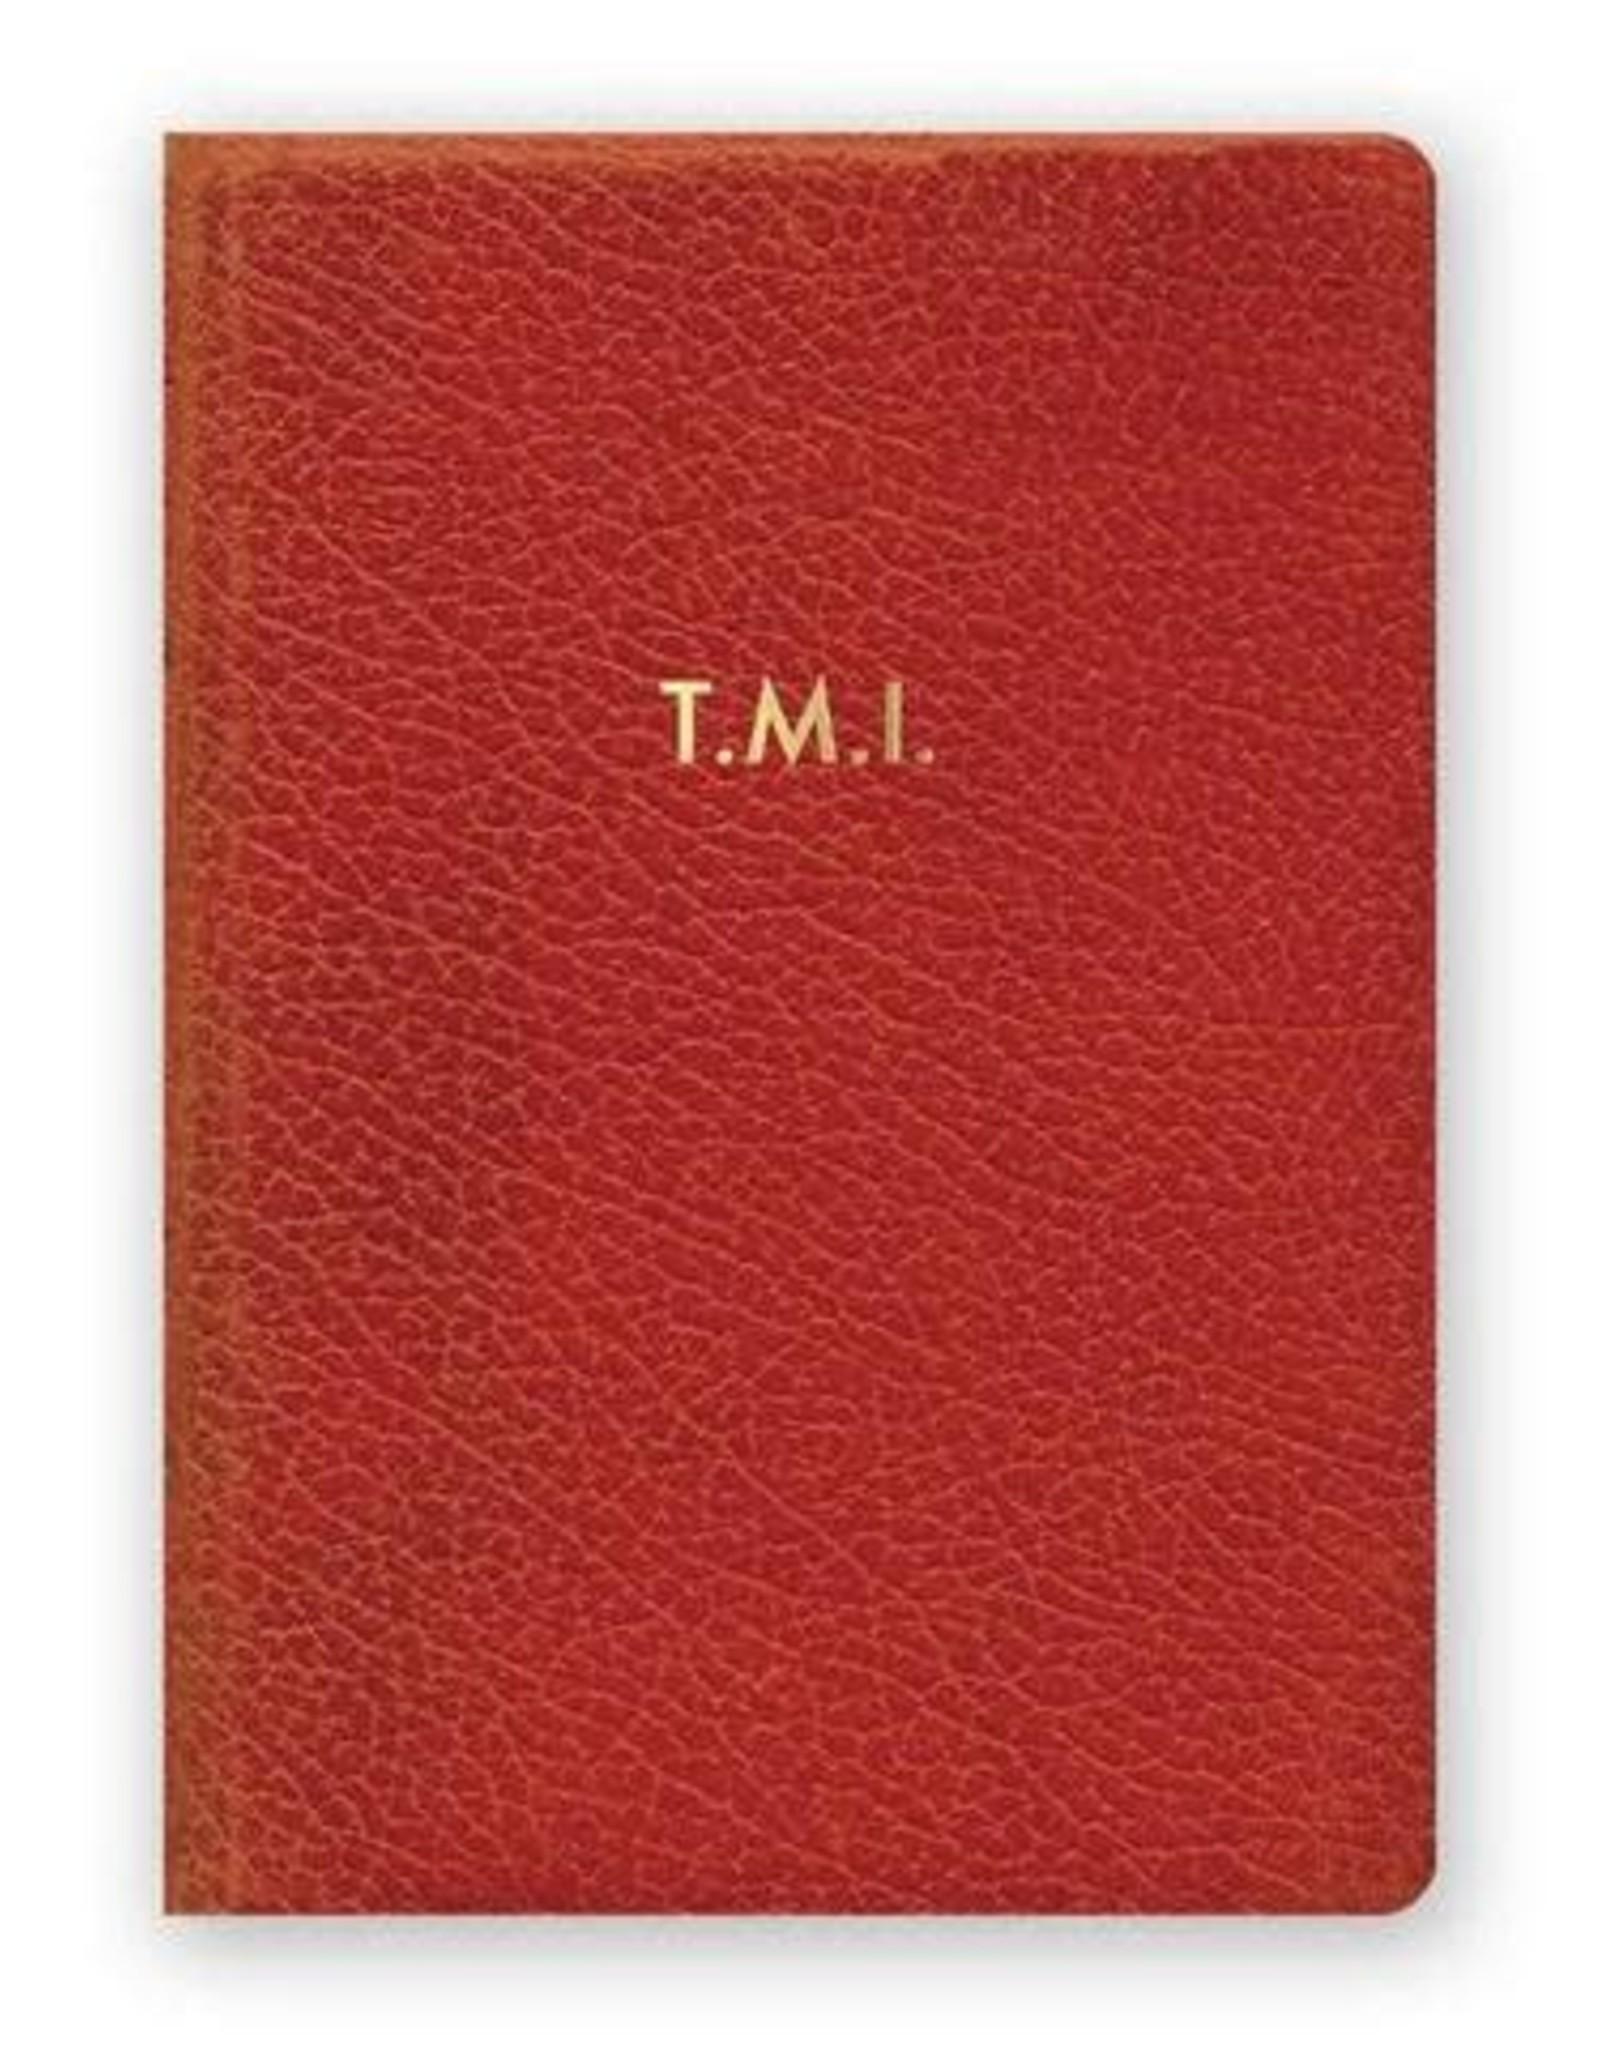 "Mincing Mockingbird ""T.M.I."" Journal by Mincing Mockingbird"